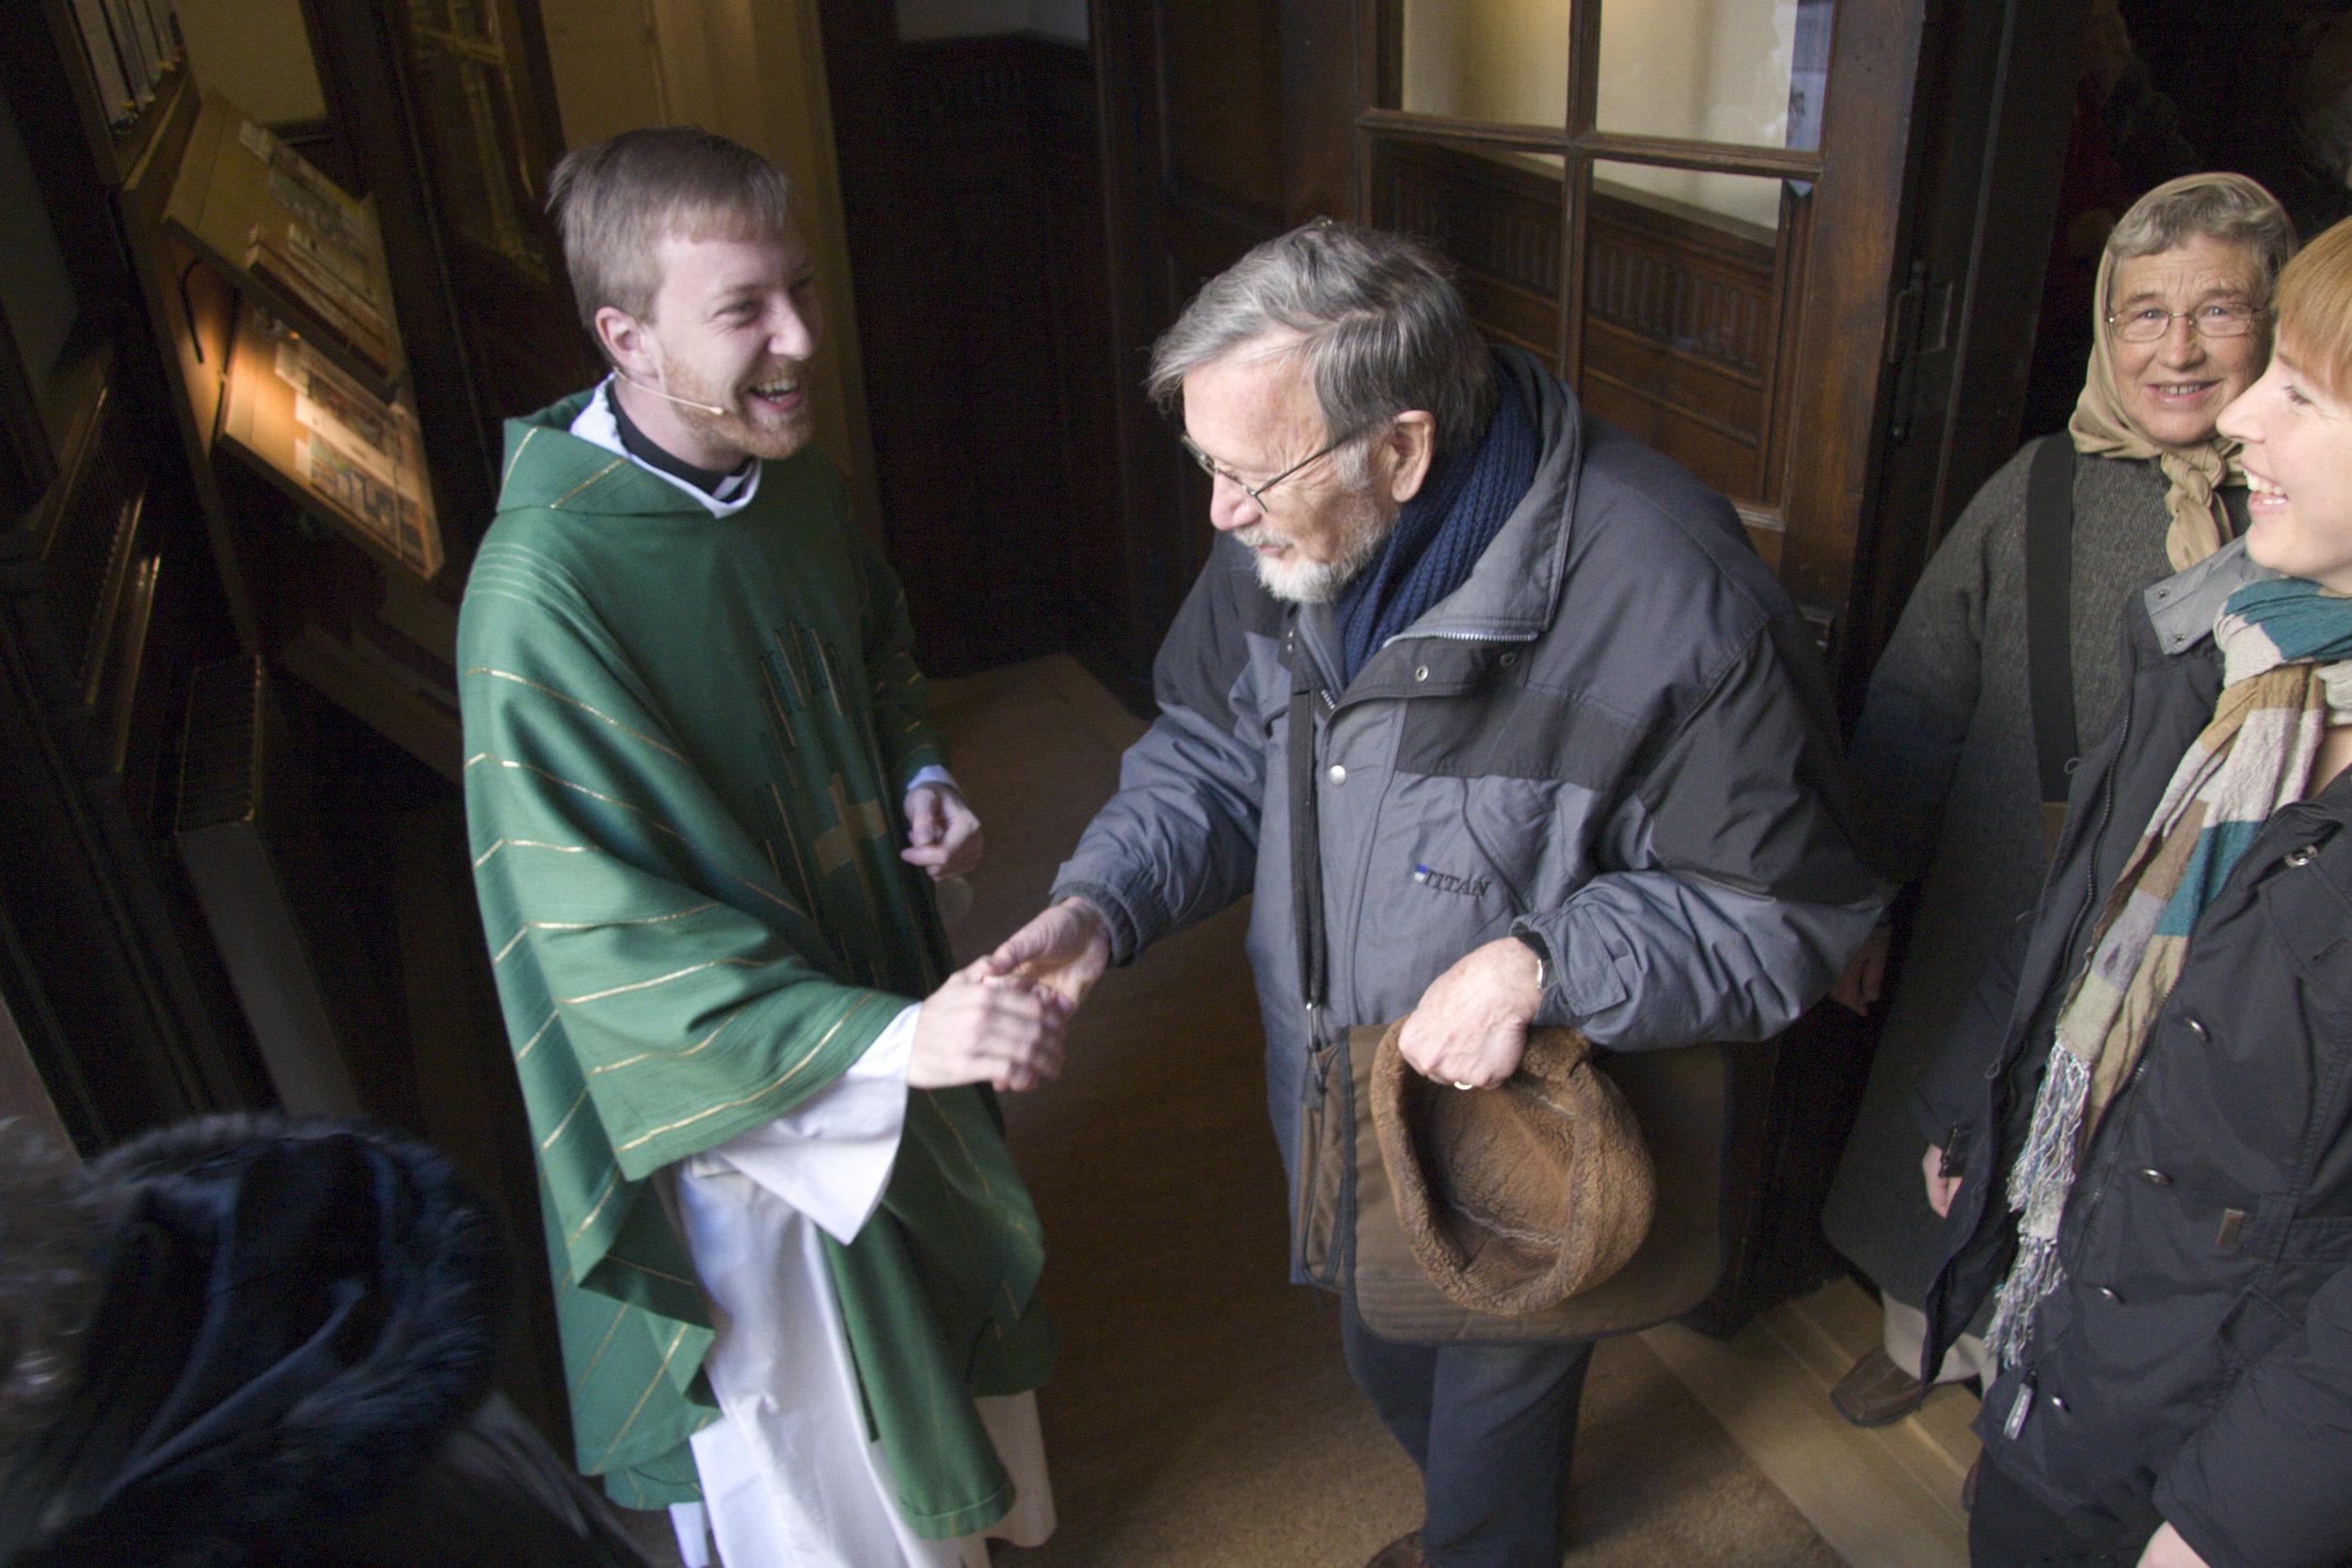 Daniel Nørgaard shakes hands with parishioners at the doors of Sankt Ansgar's Cathedralin Copenhagen.